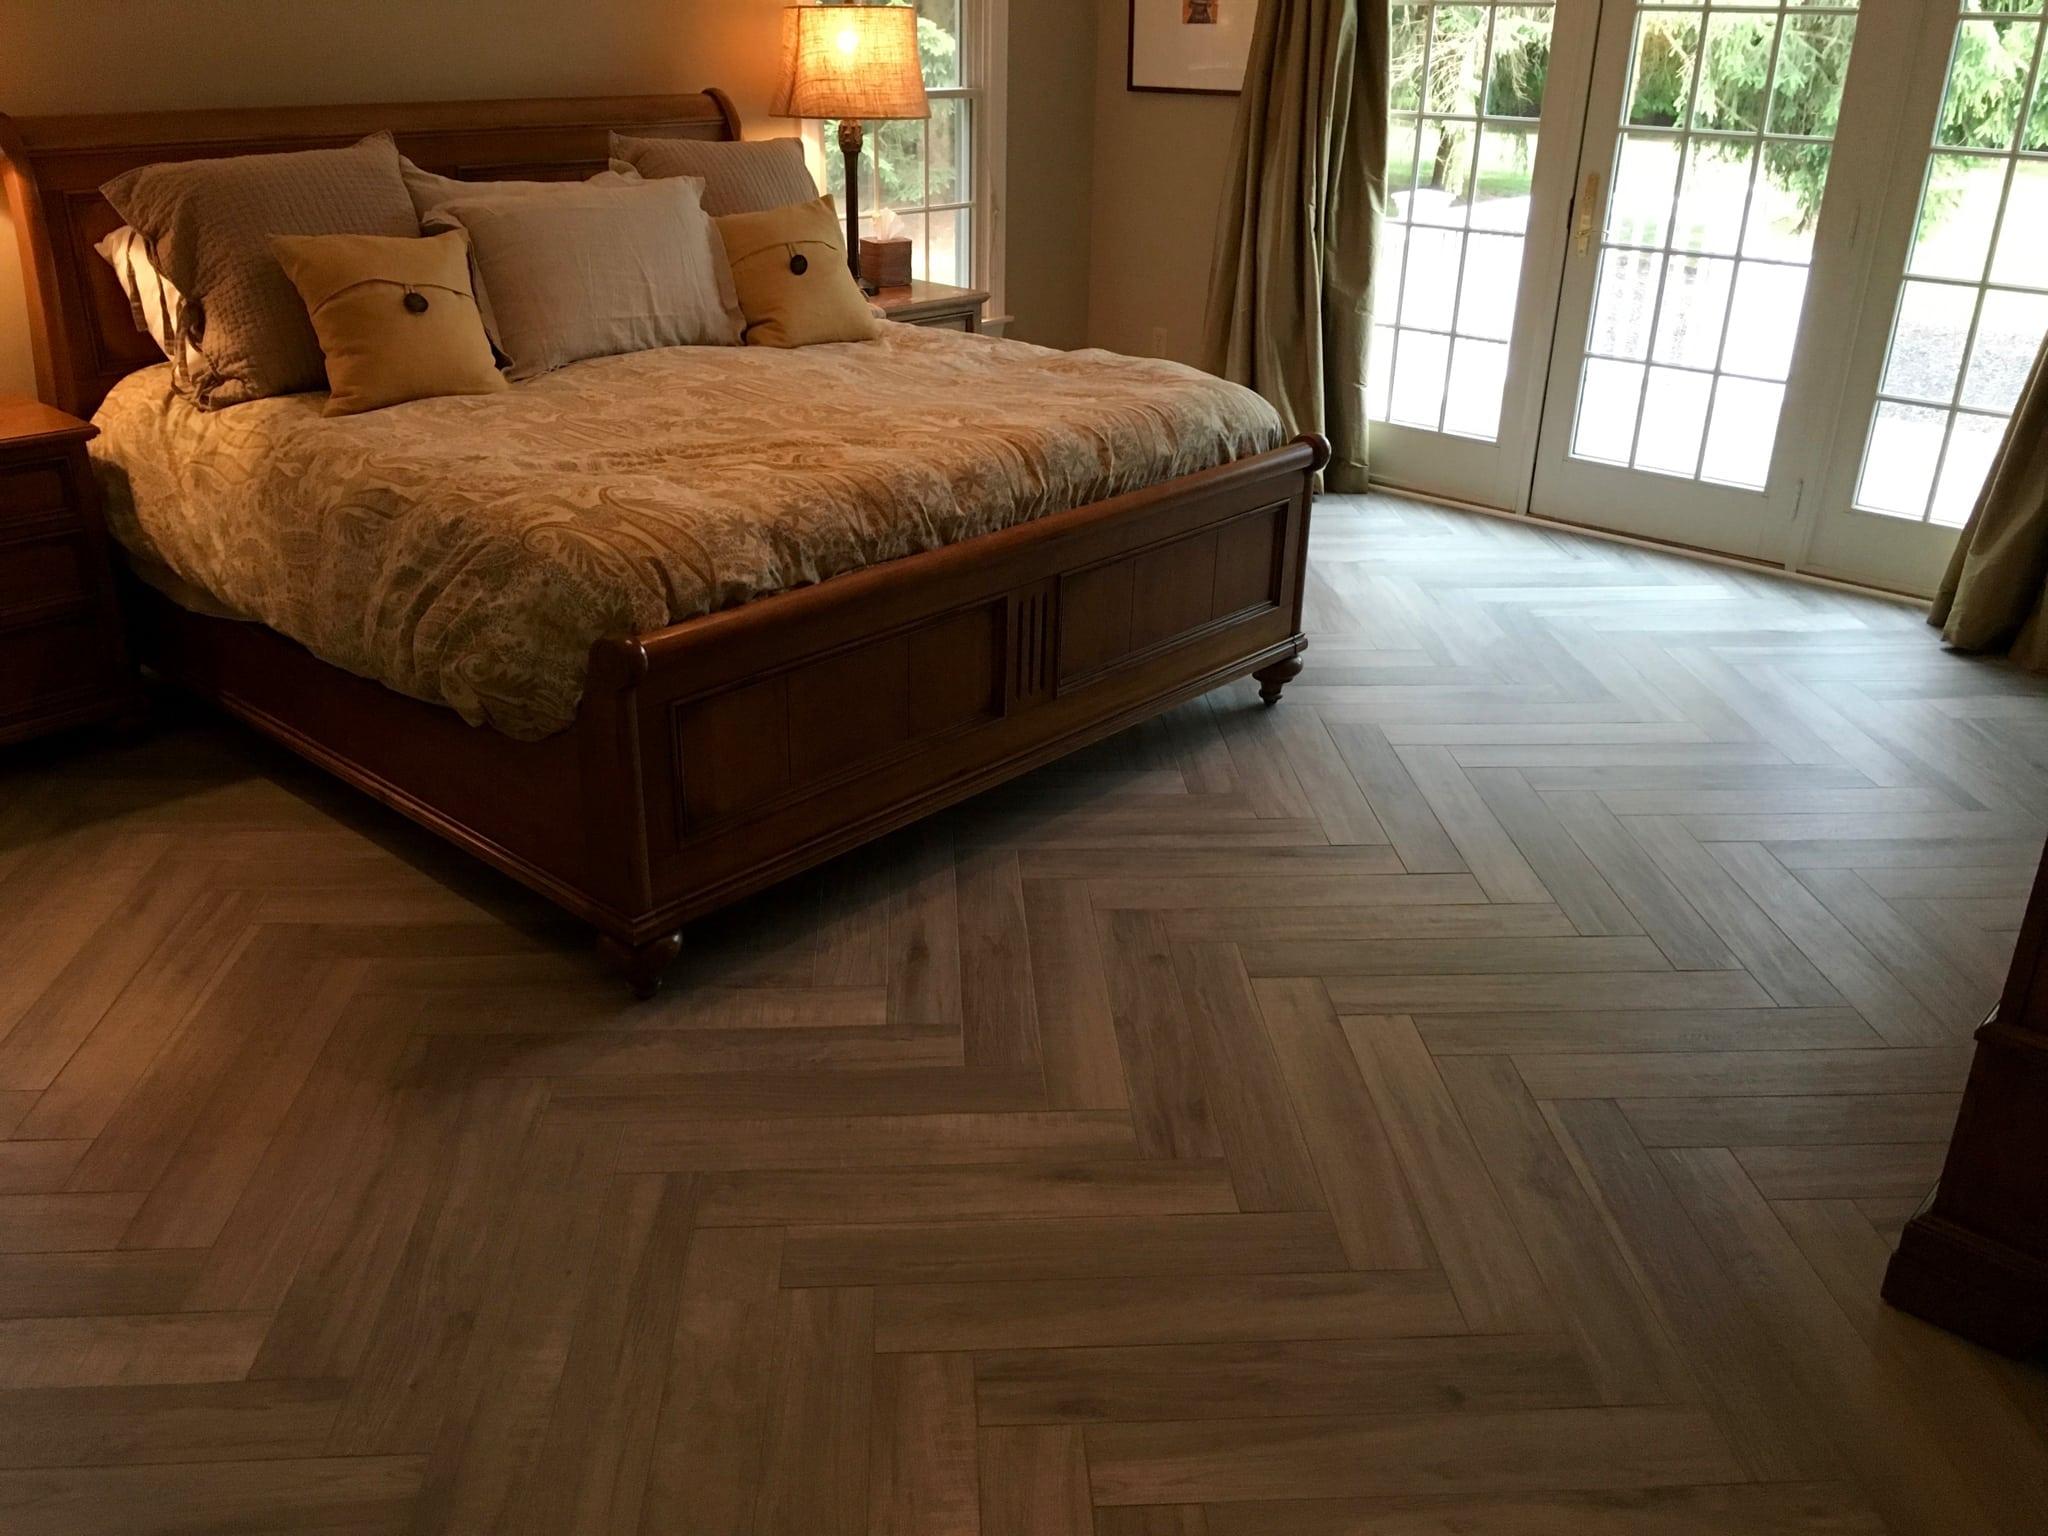 Herringbone Tile Pattern By Best Tile And Wood Rt 31 Flemington Nj